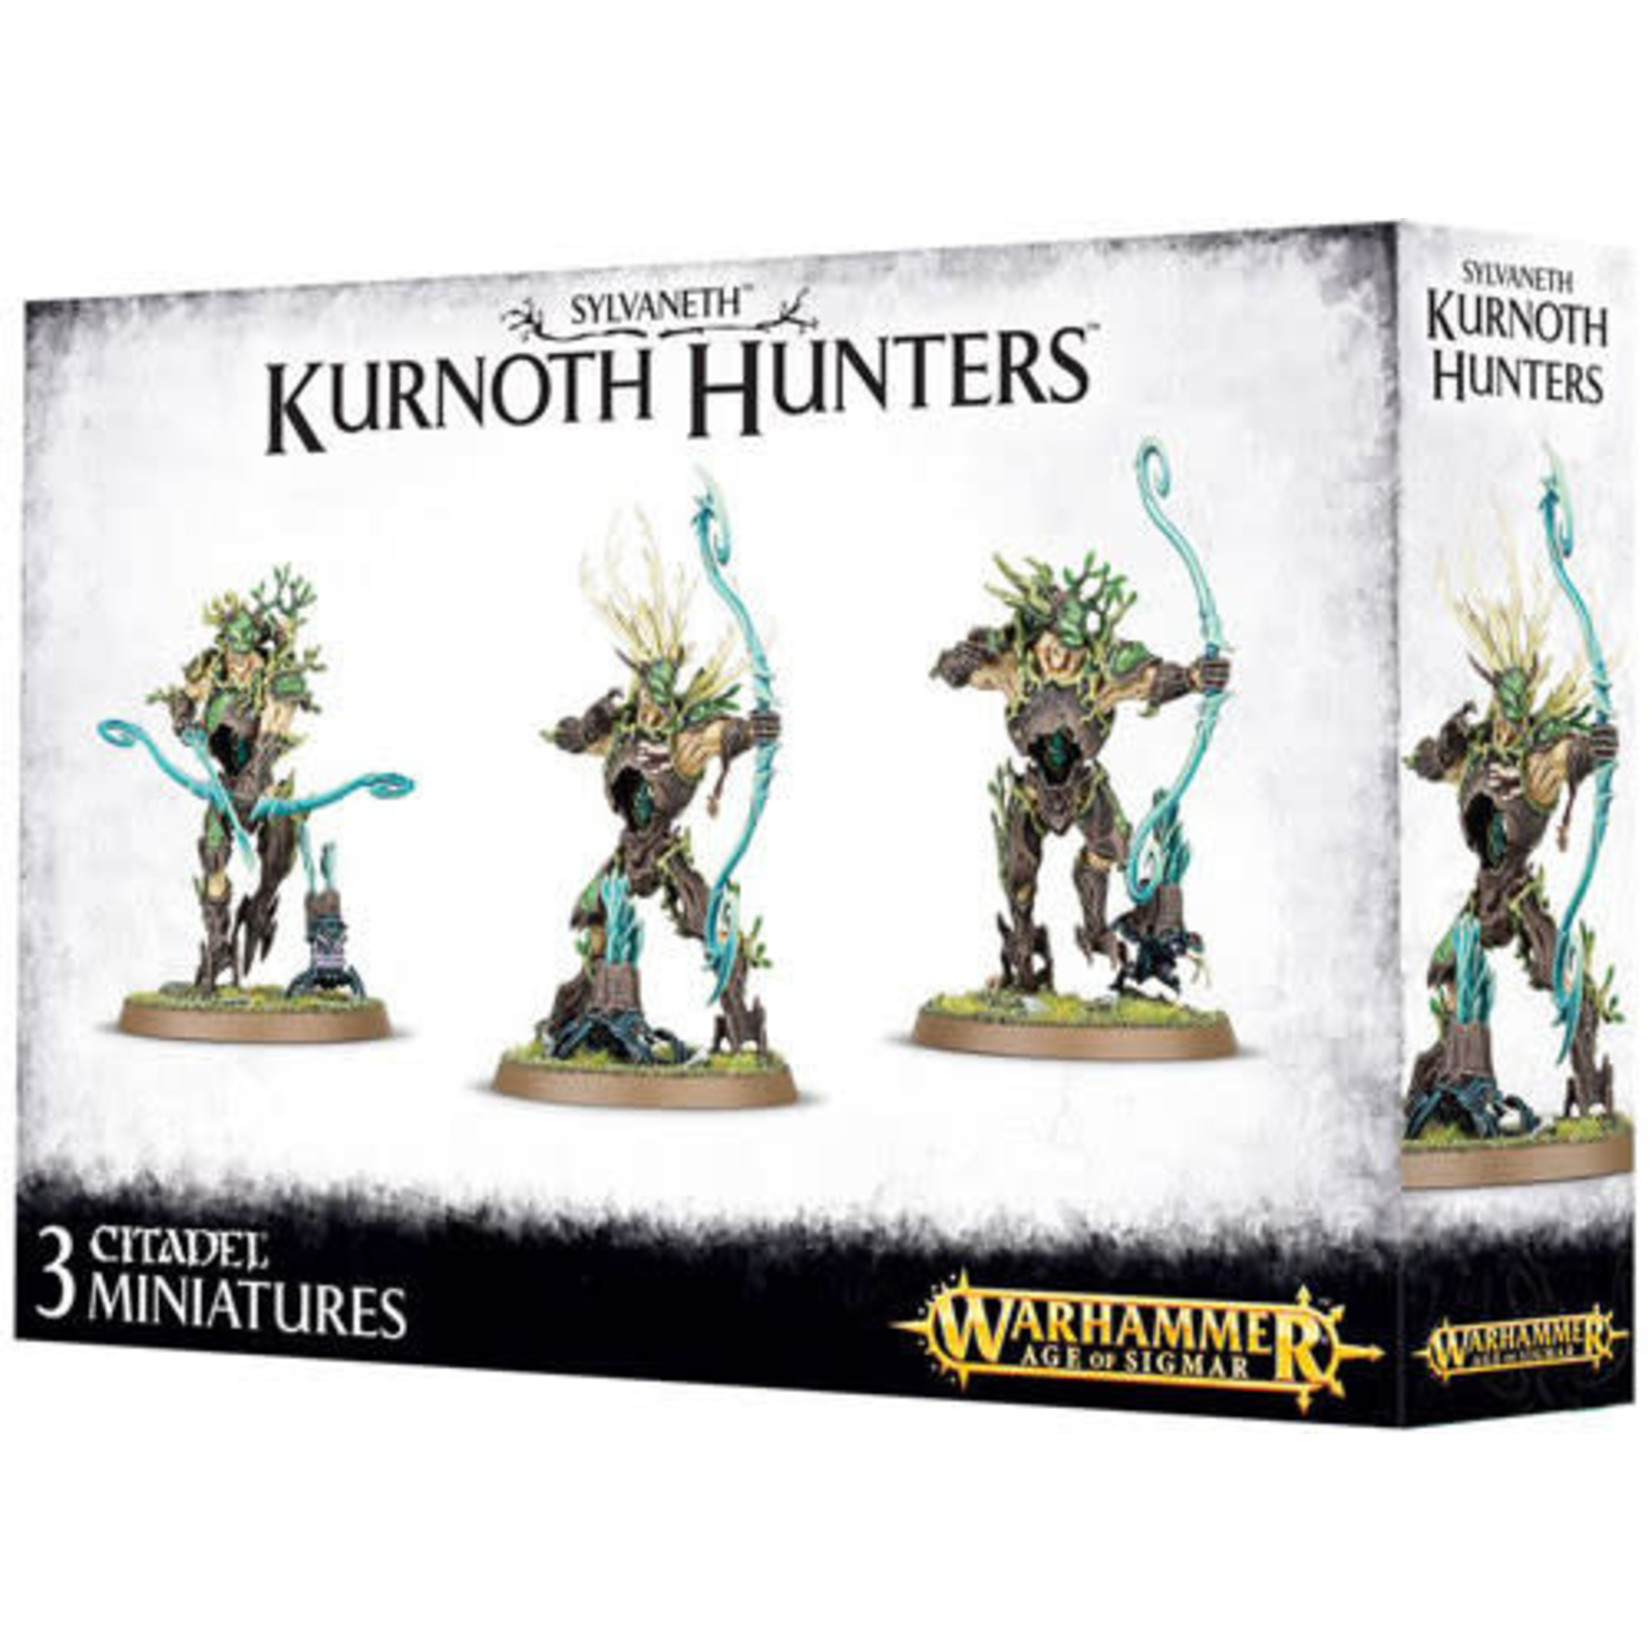 Games Workshop Warhammer Age of Sigmar: Sylvaneth Kurnoth Hunters